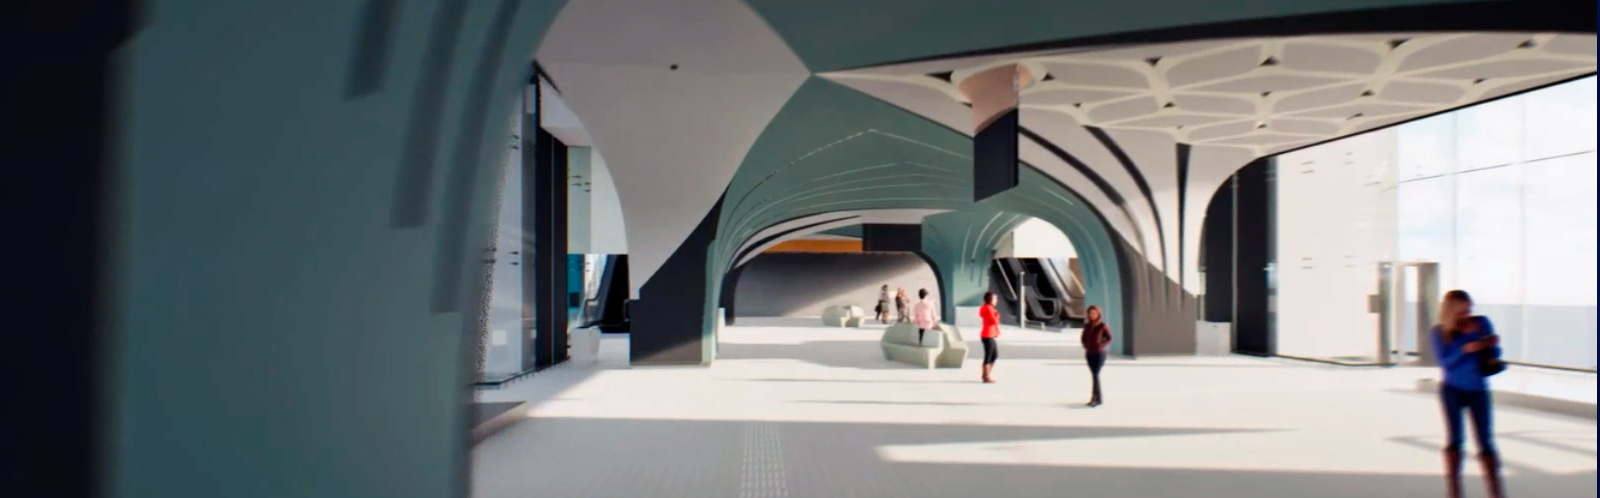 estación-de-metro-internacional